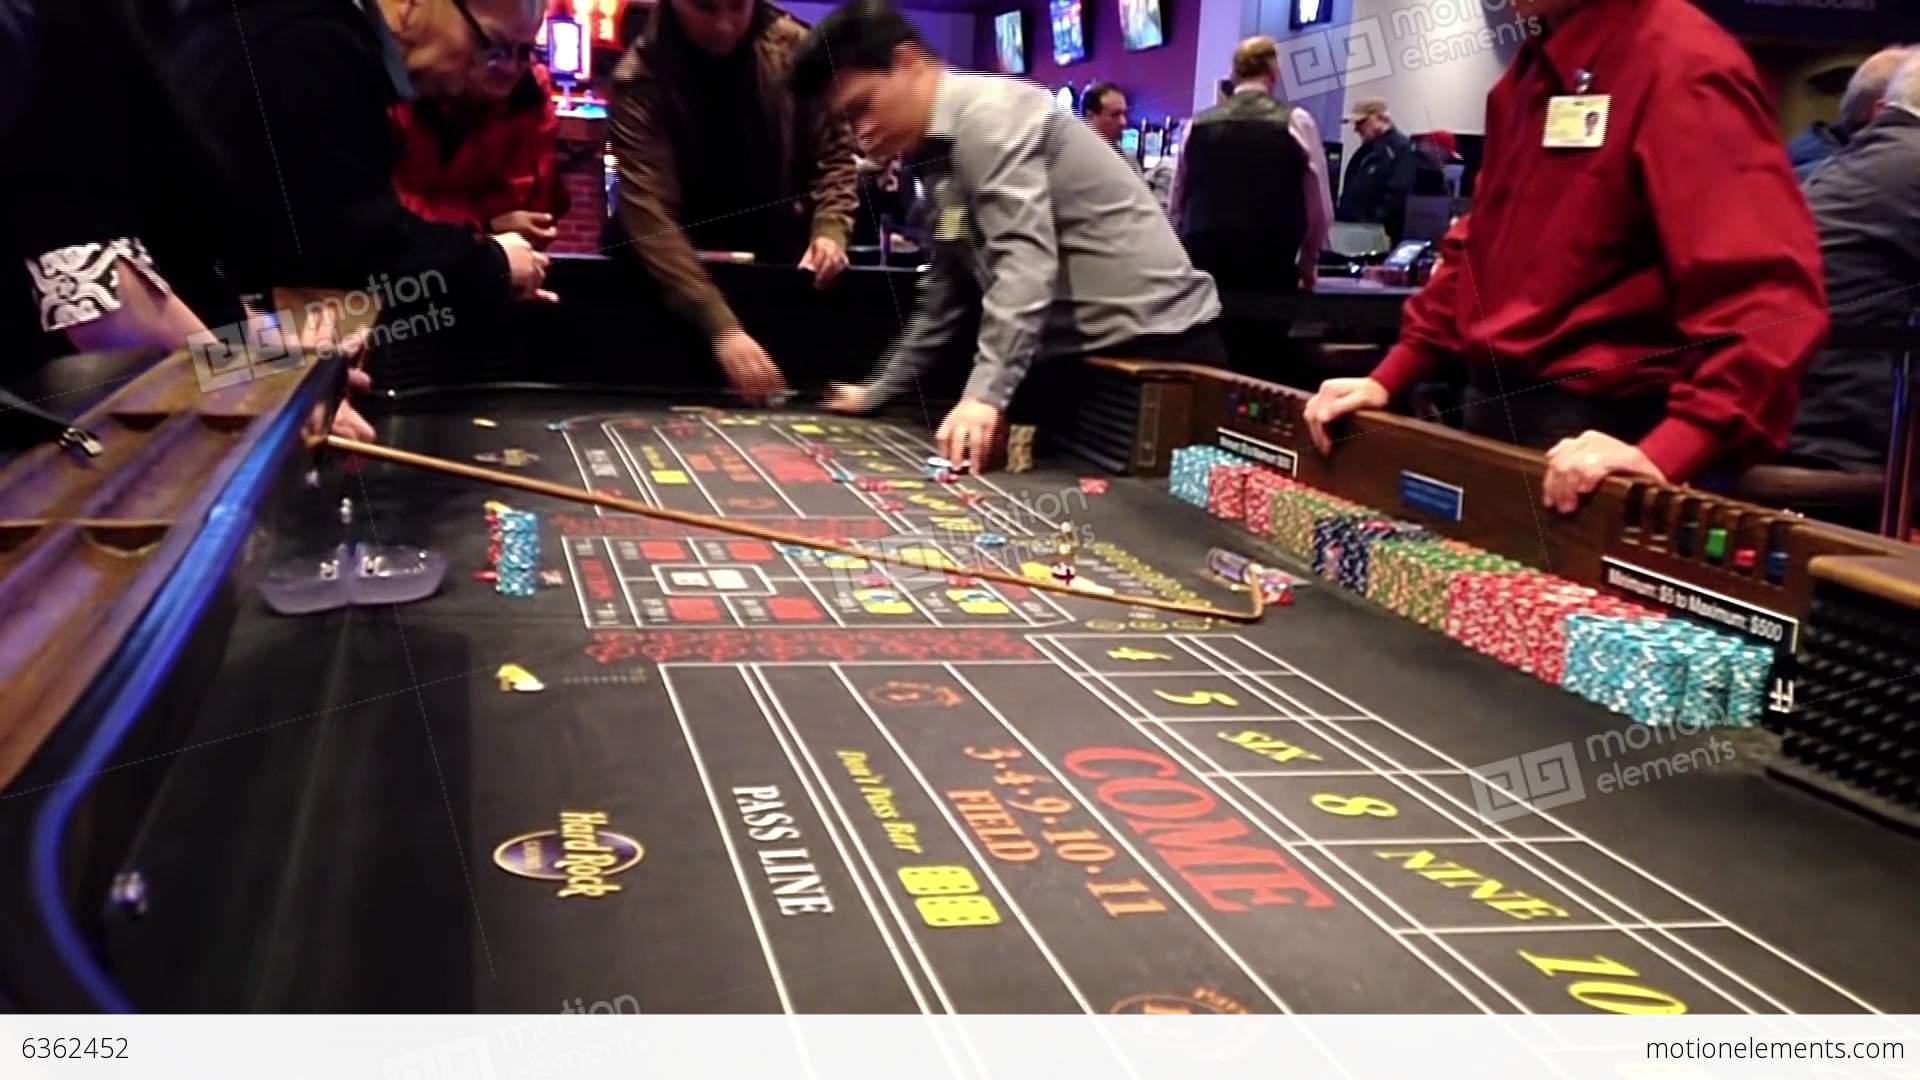 Torneo poker punta cana 2015